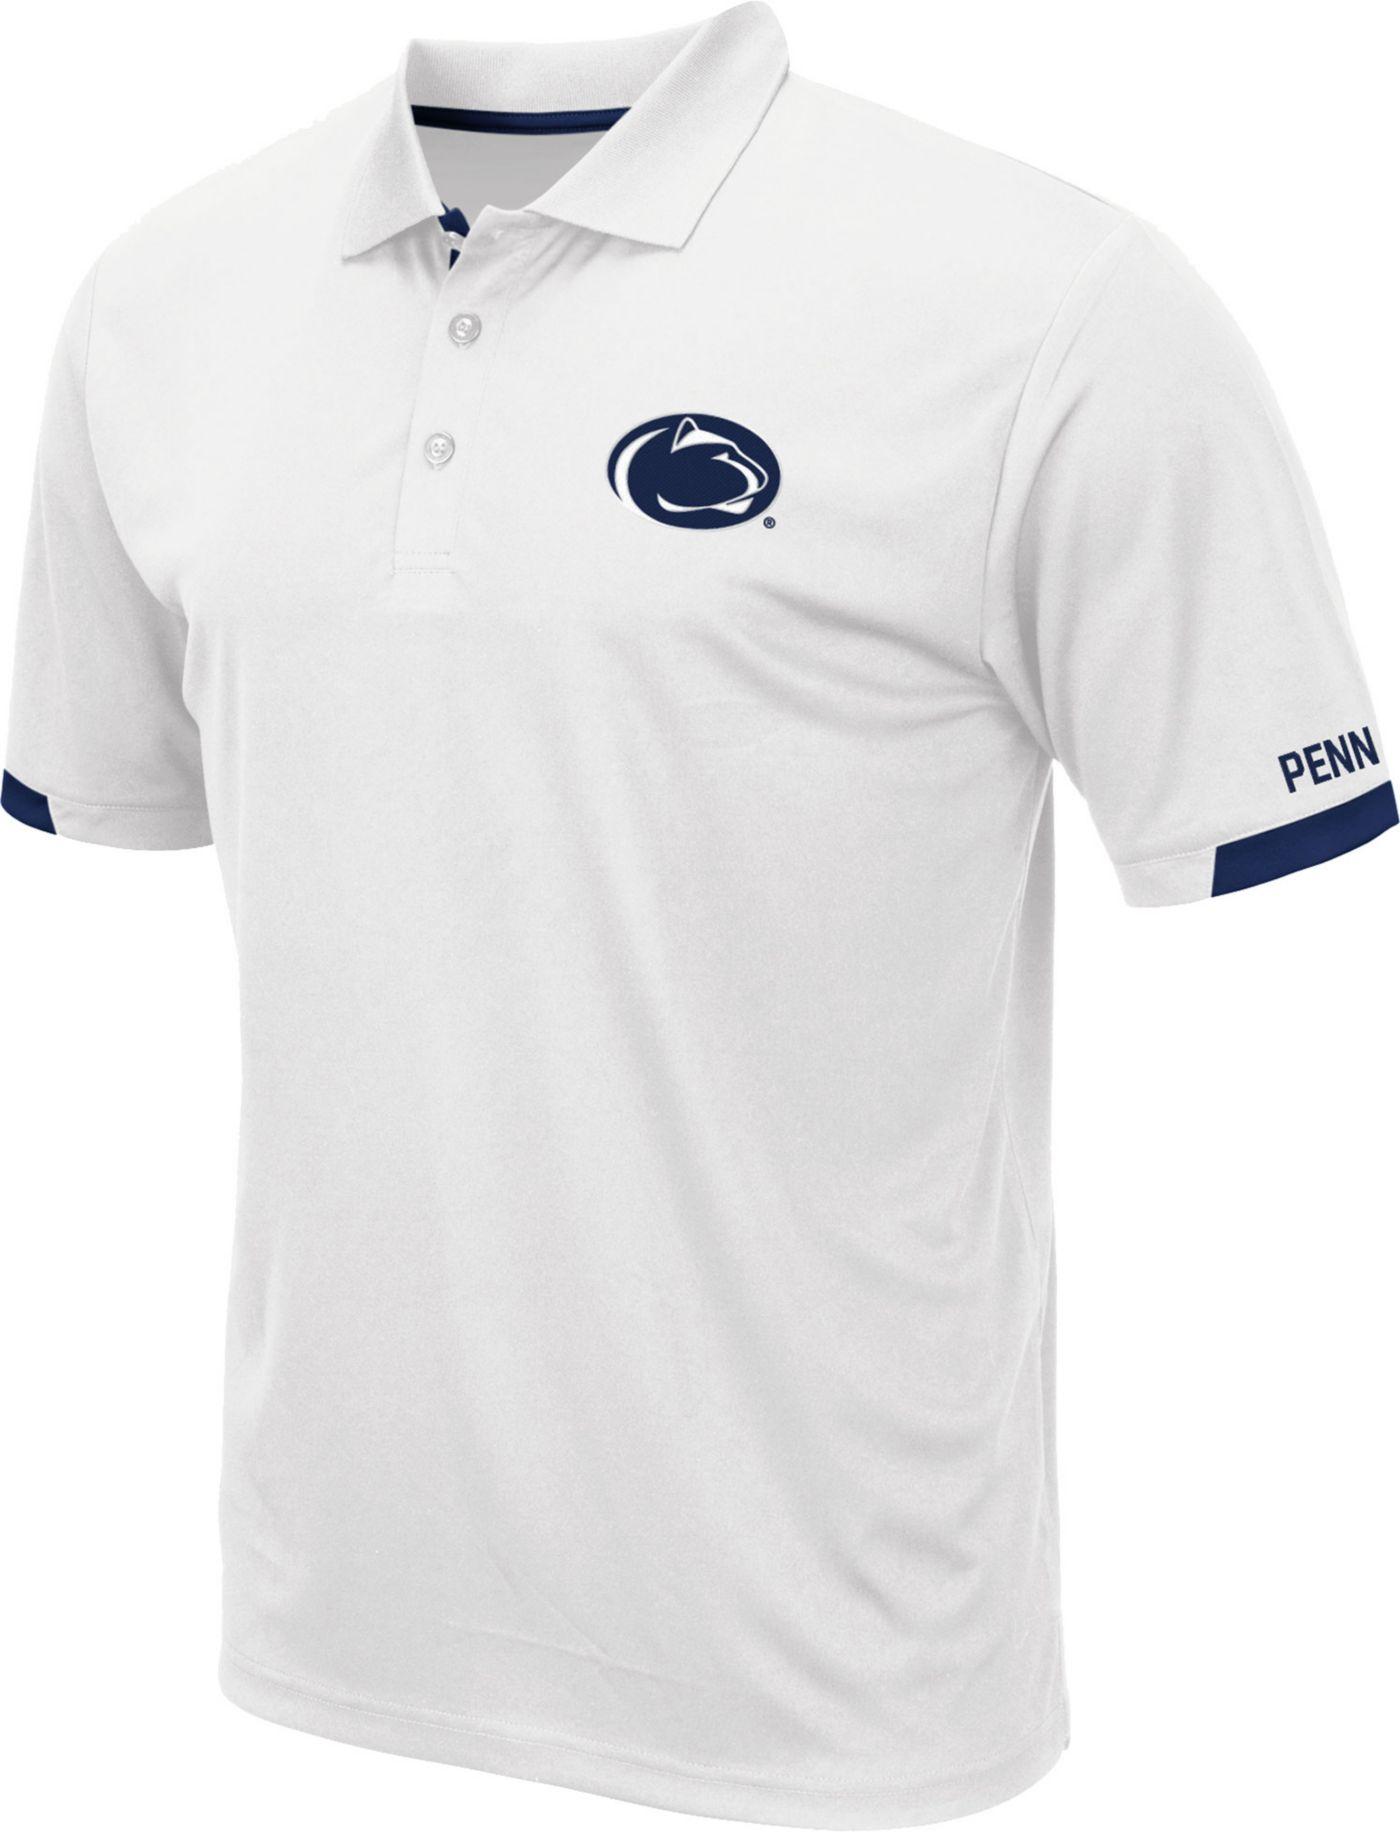 Colosseum Men's Penn State Nittany Lions Fairway White Polo